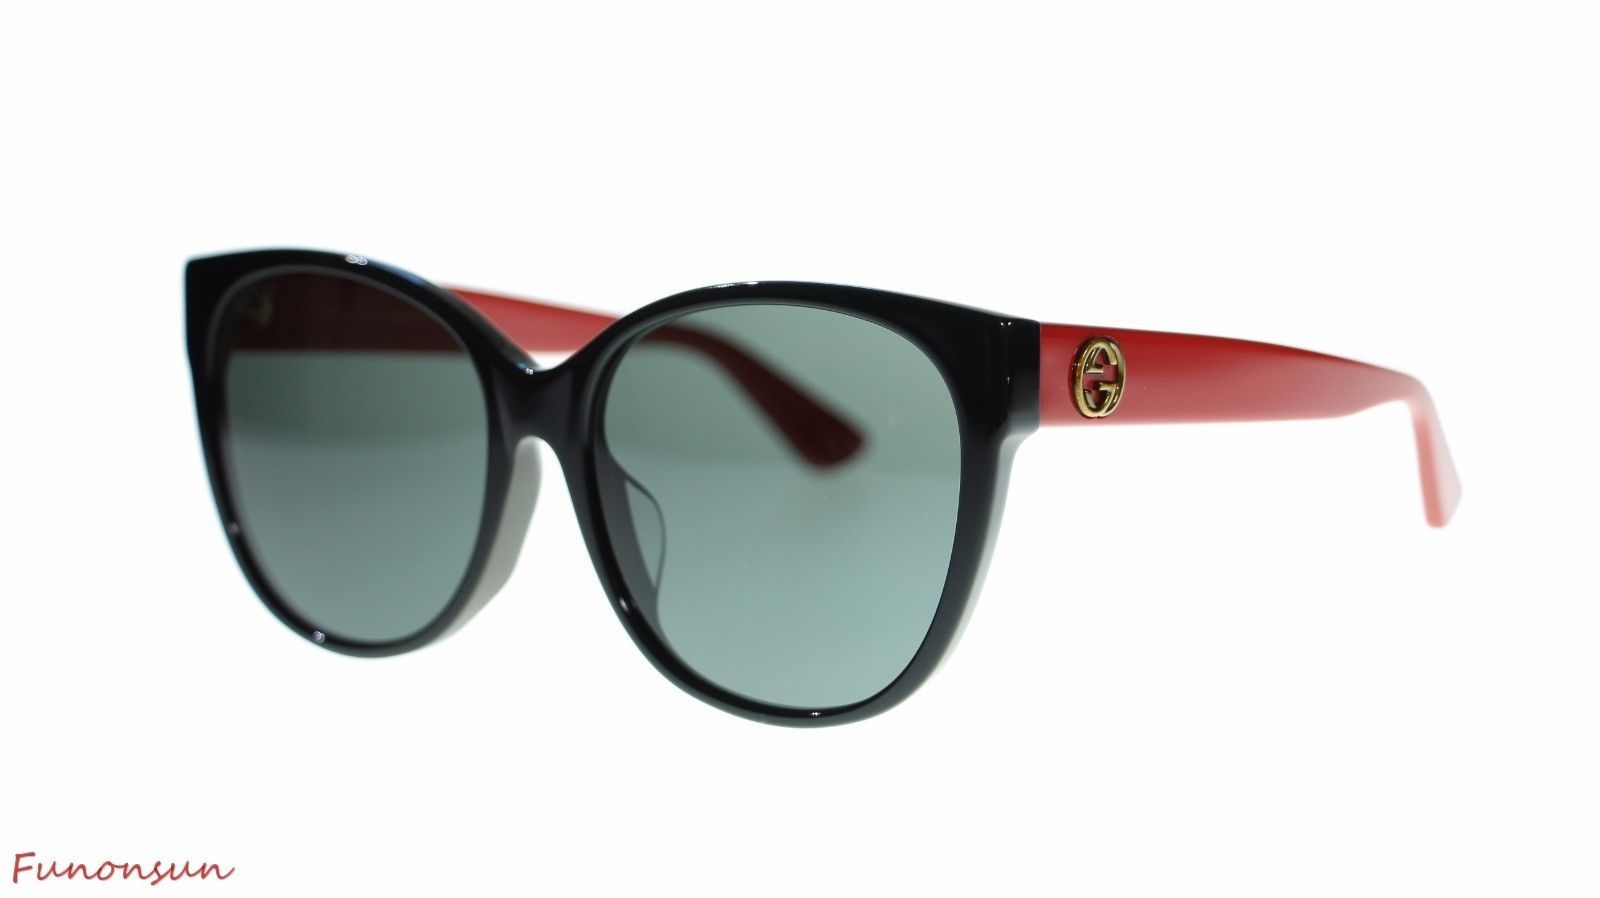 40f859f7c3f S l1600. S l1600. Previous. Gucci Women Cat Eye Sunglasses GG0097SA 004  Black Red Grey Gradient Lens 58mm